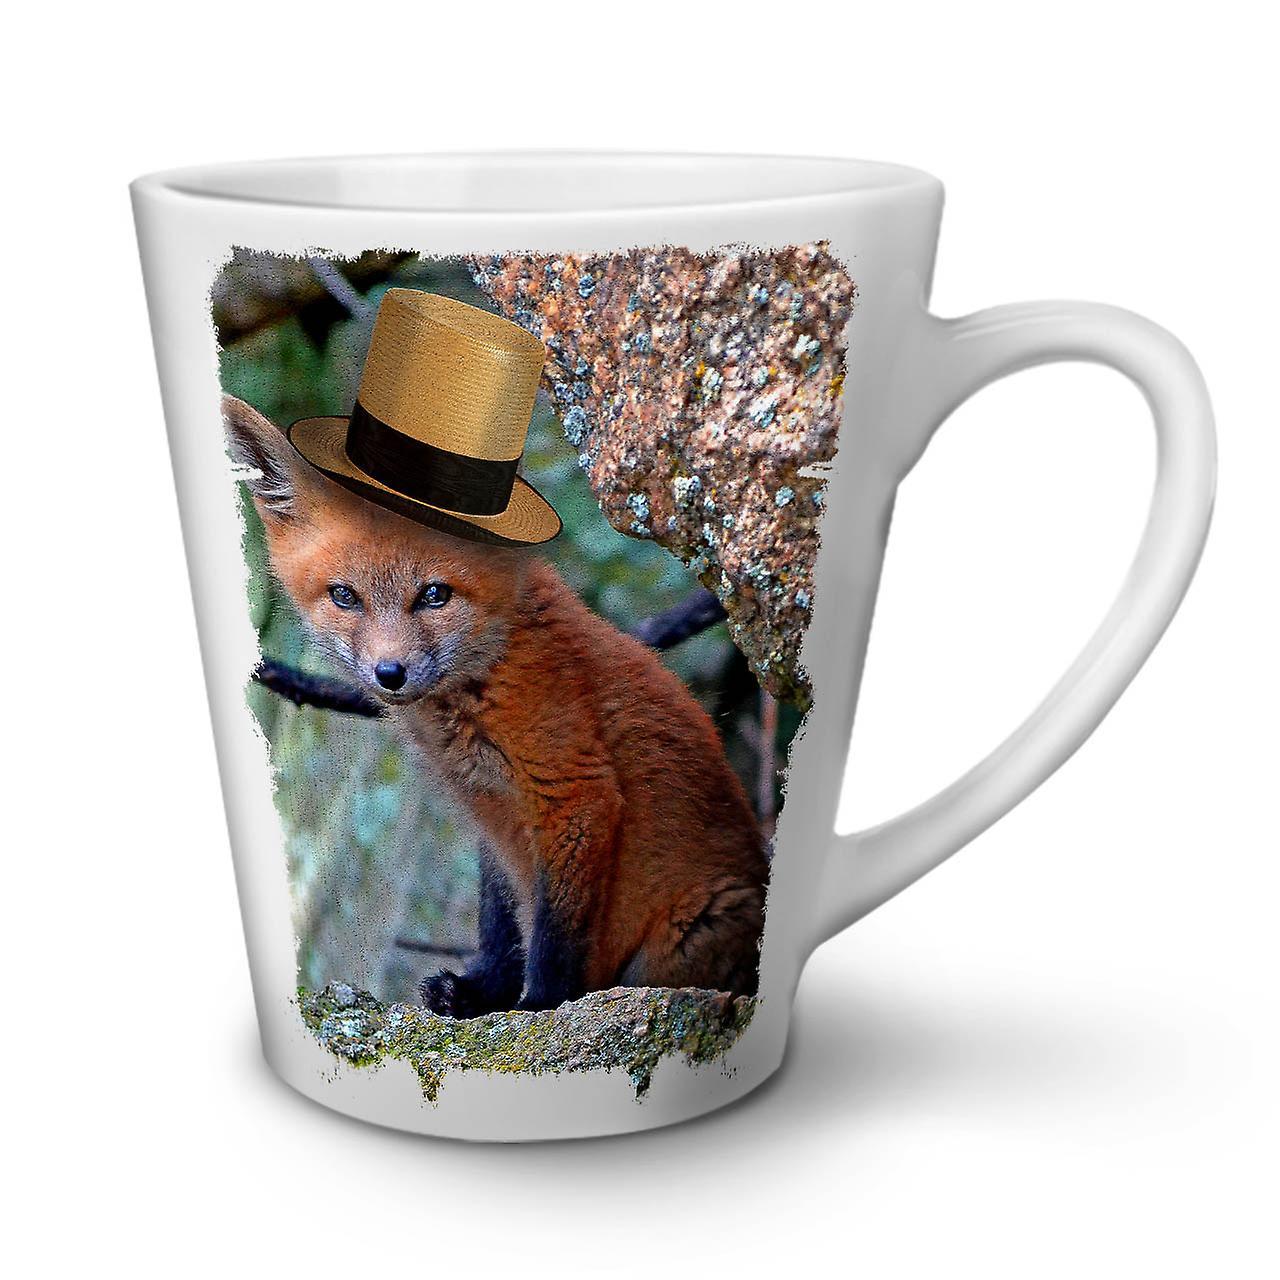 Blanche En Chapeau OzWellcoda Nouvelle Café Tasse Animal Latte Cool Fox 12 Céramique tdQsCrhxB